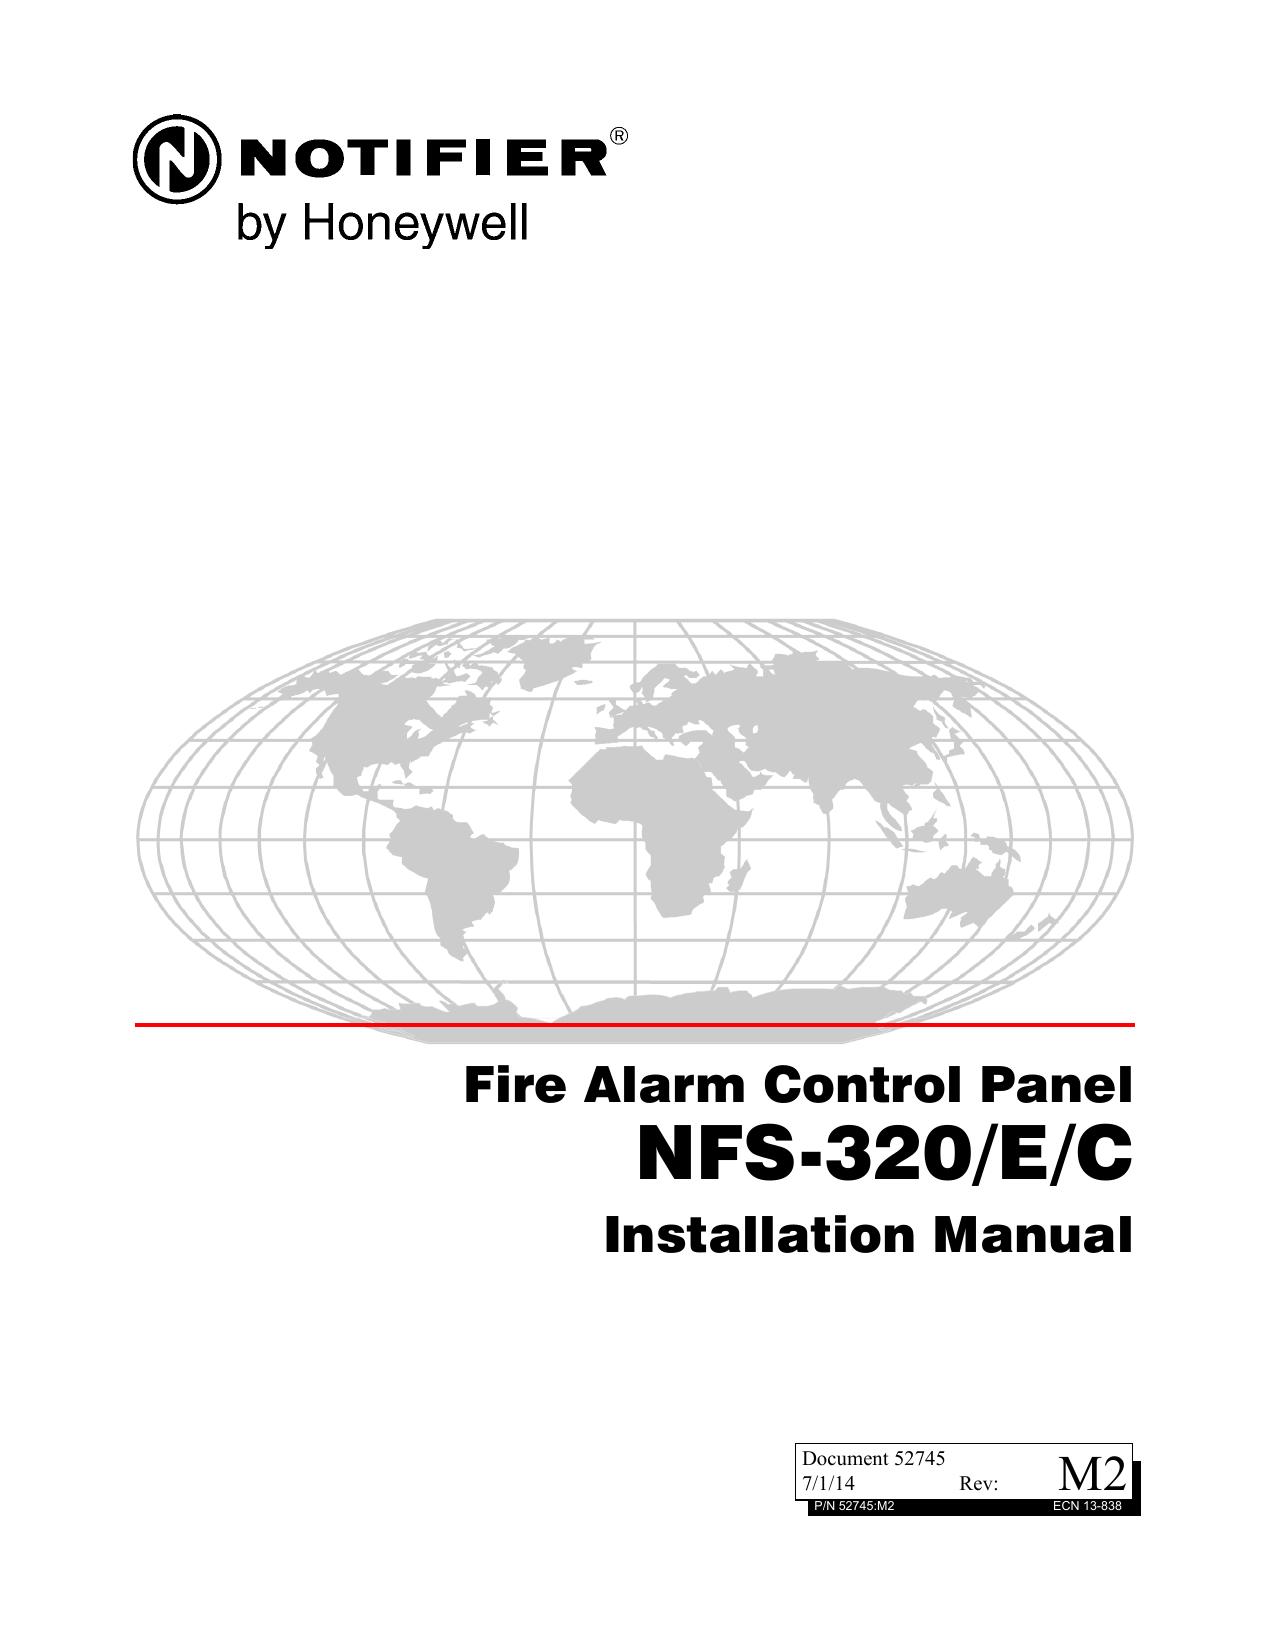 Awe Inspiring Nfs 320 E C Fps Fire Protection Systems Manualzz Com Wiring Cloud Rometaidewilluminateatxorg